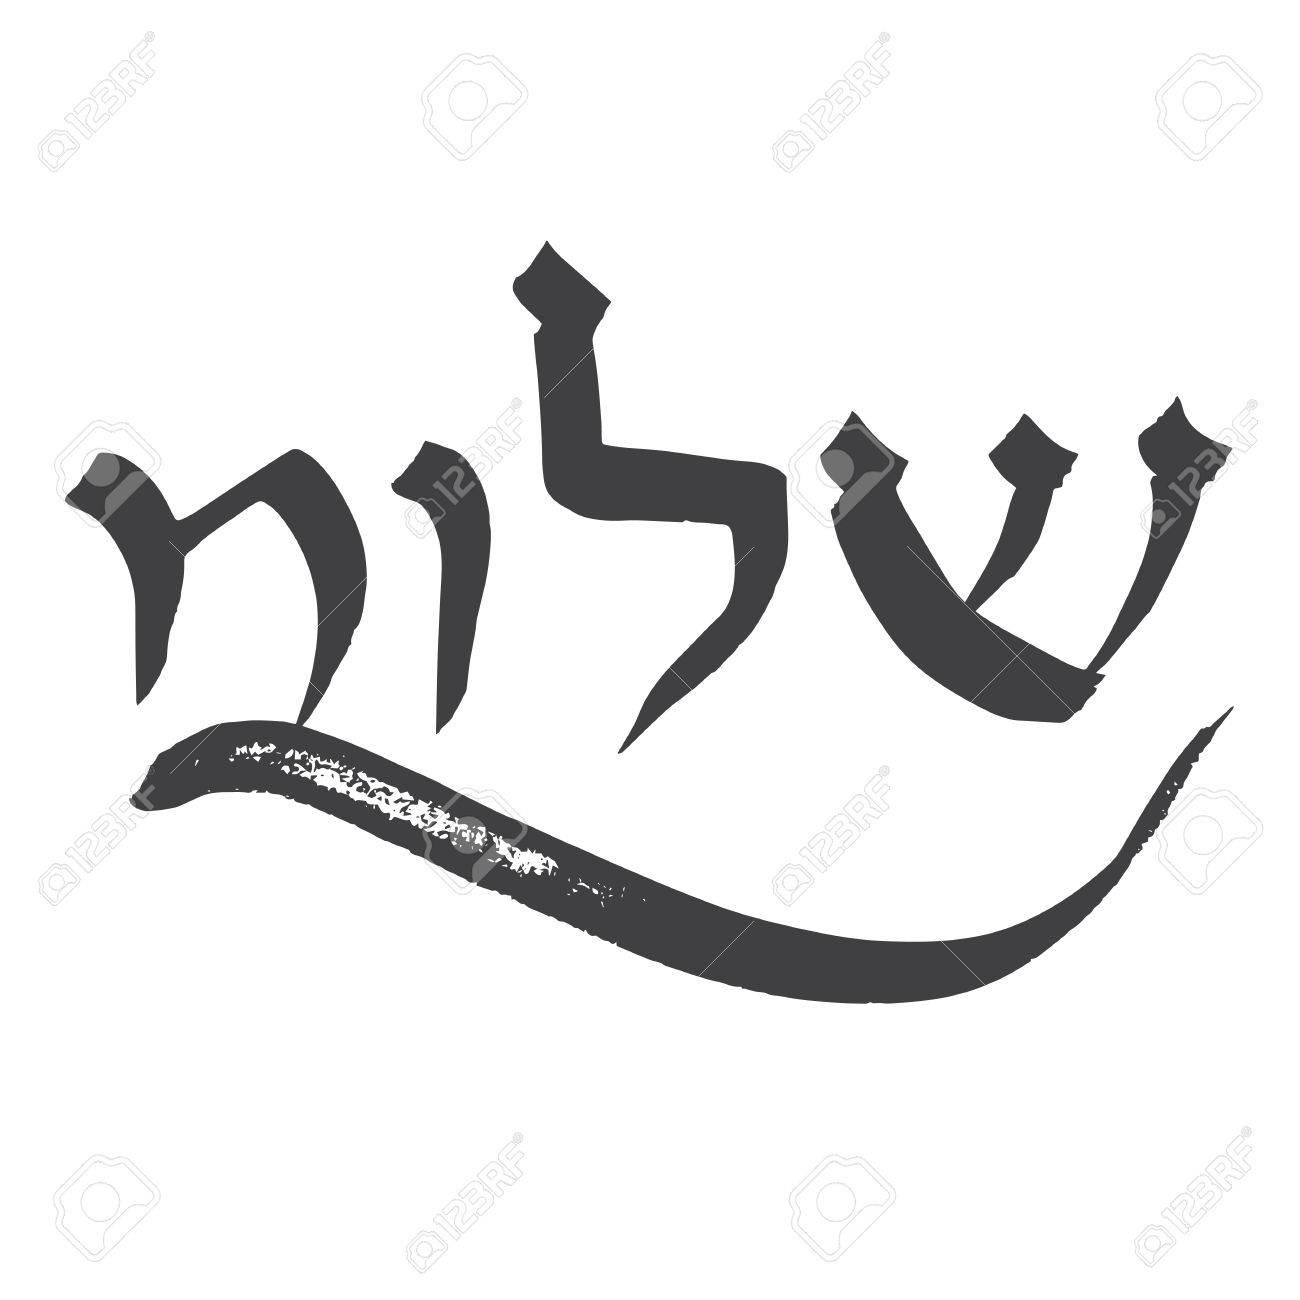 Handmade brush calligraphy, Shalom, Hebrew word meaning hello